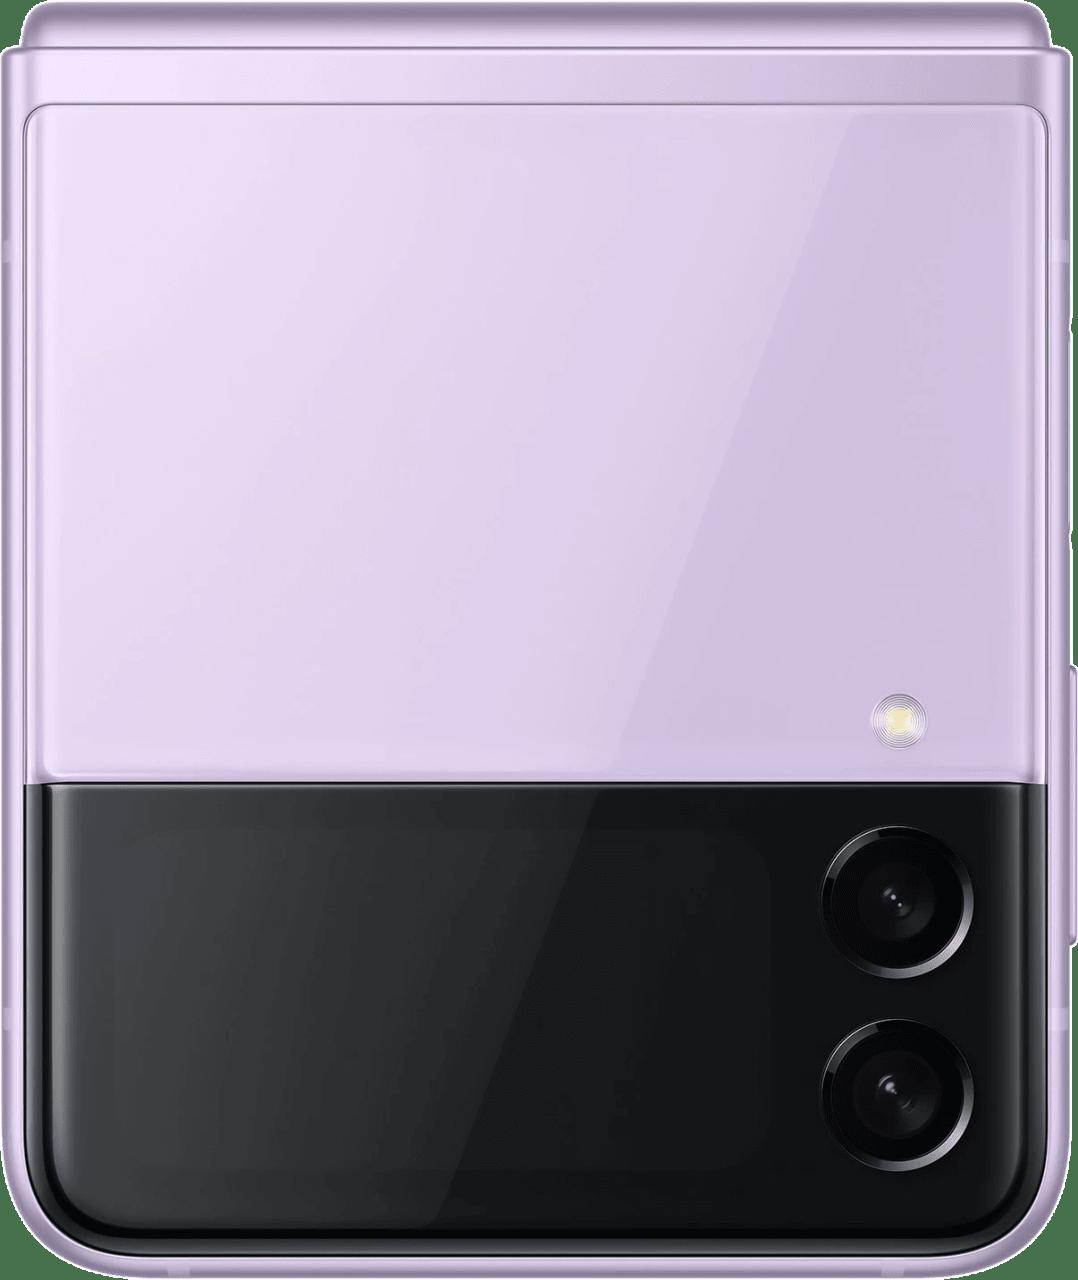 Lavender Samsung Smartphone Galaxy Flip 3 - 128GB - Single Sim.4